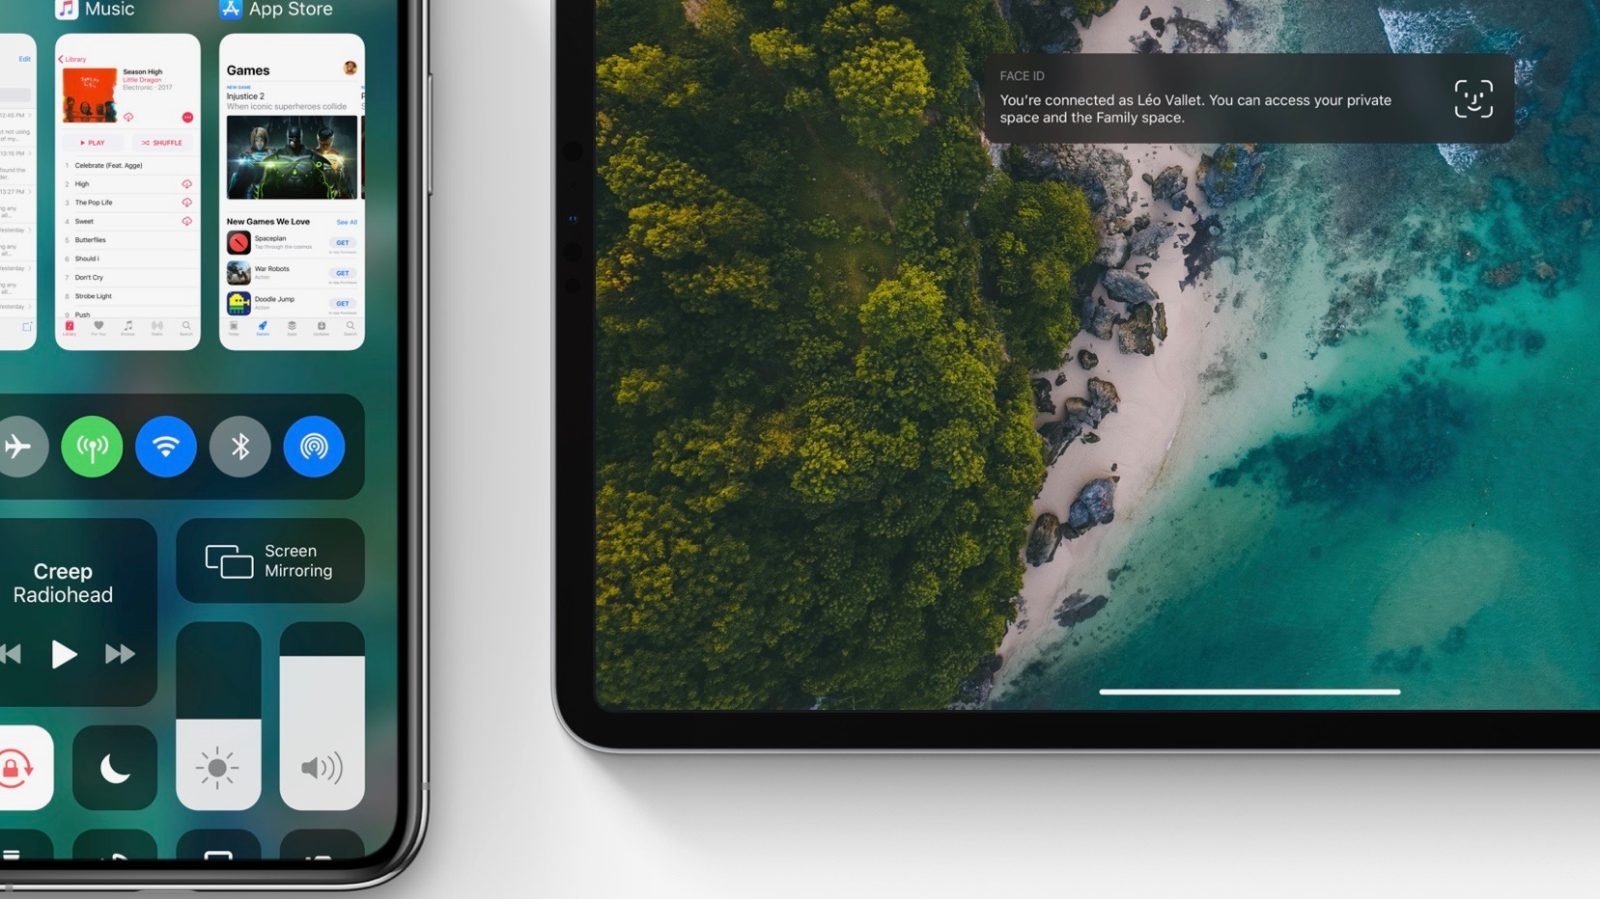 iOS 13 Concept Imagines New Volume UI, Control Center Multitasking, iPad Mouse Support, More